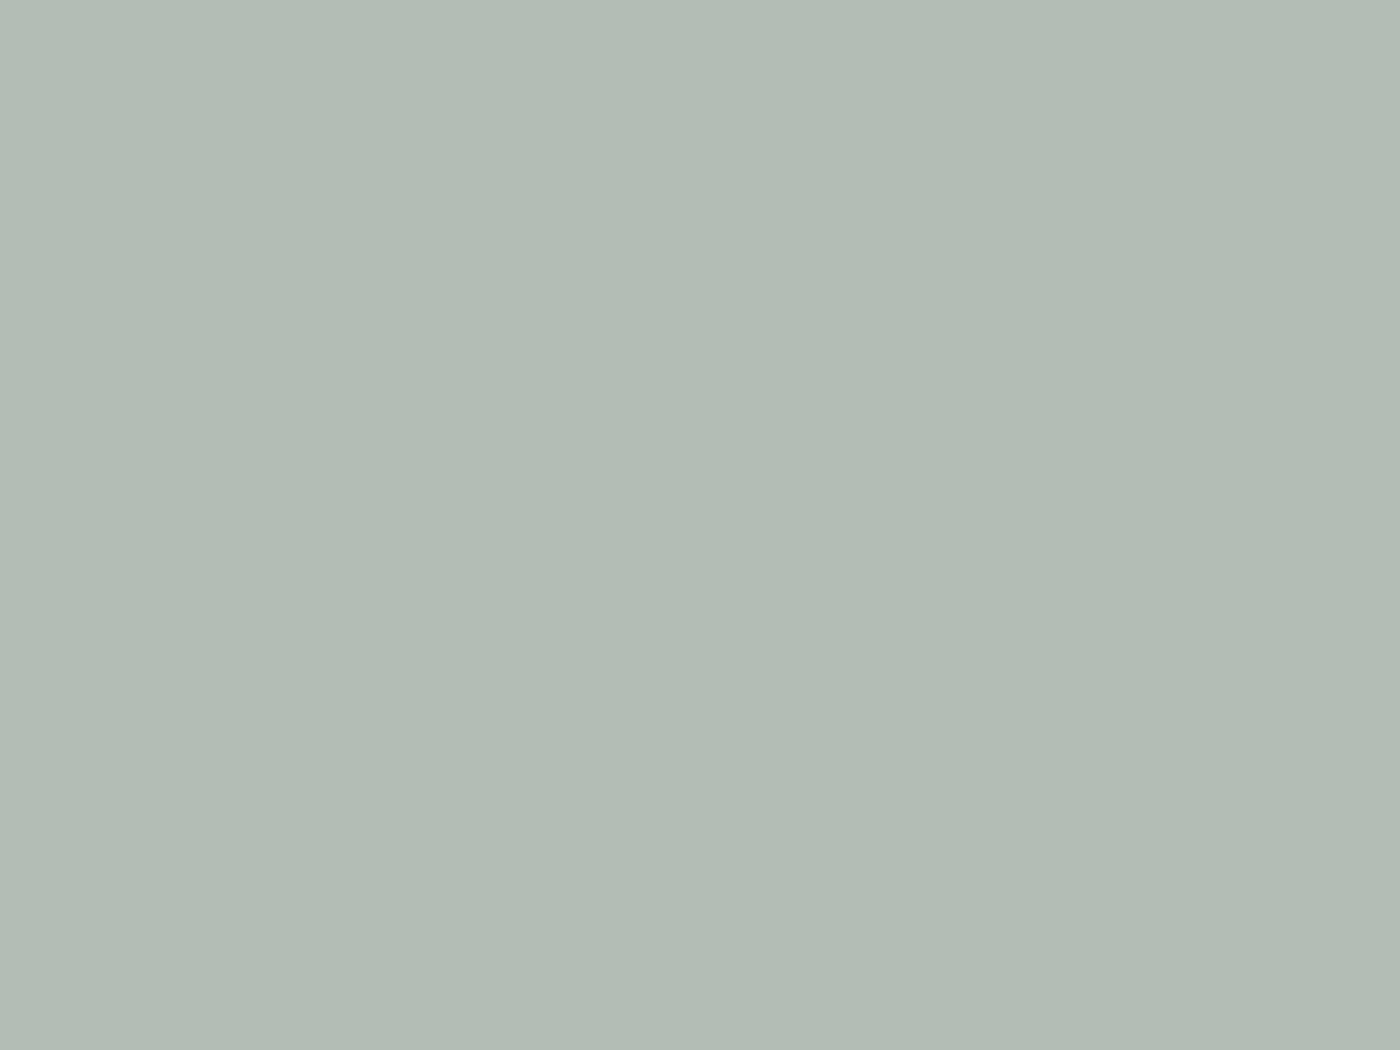 1400x1050 Ash Grey Solid Color Background